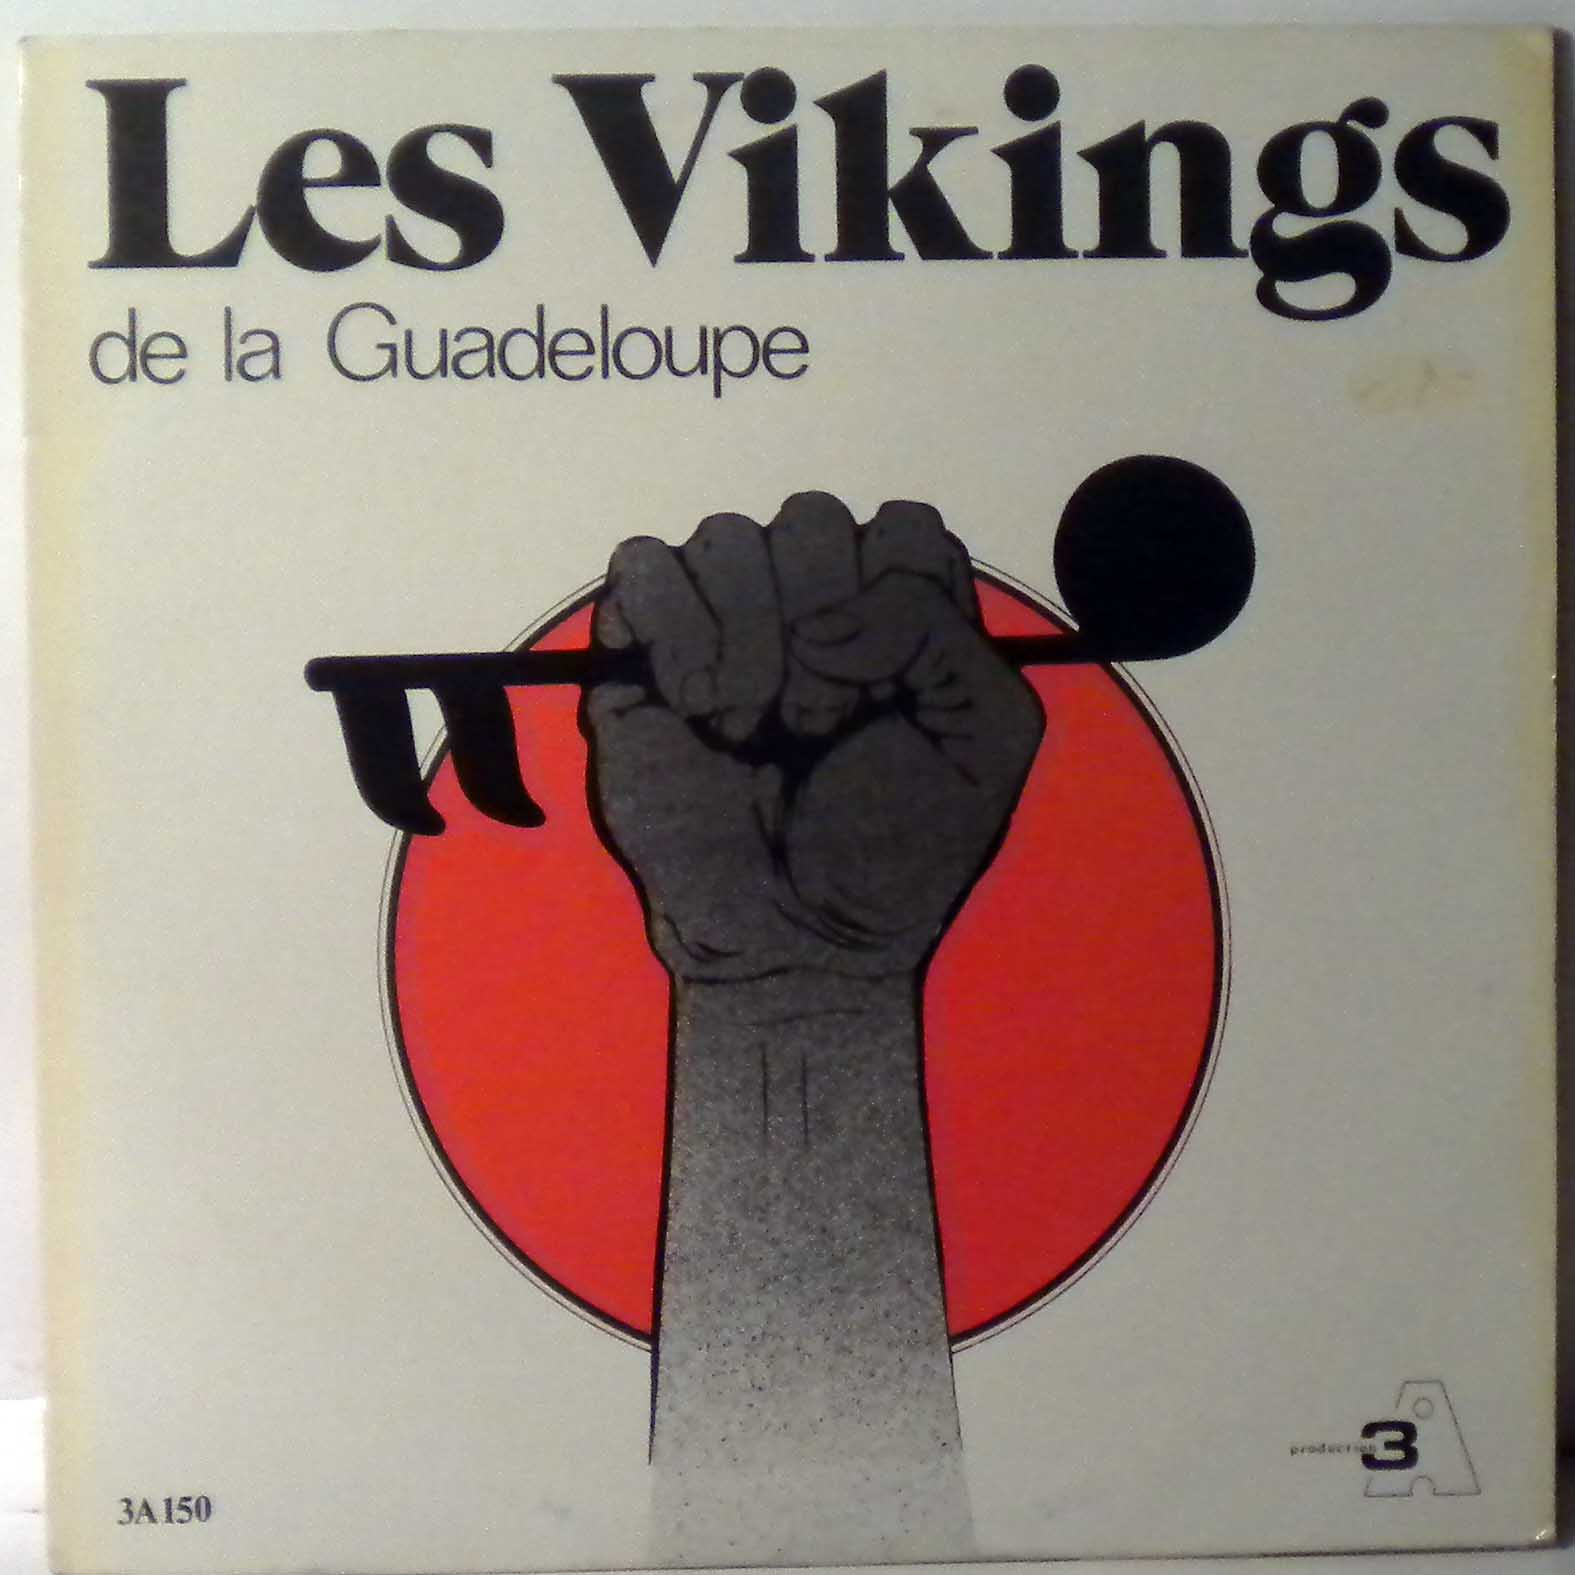 LES VIKINGS DE LA GUADELOUPE - Same - LP